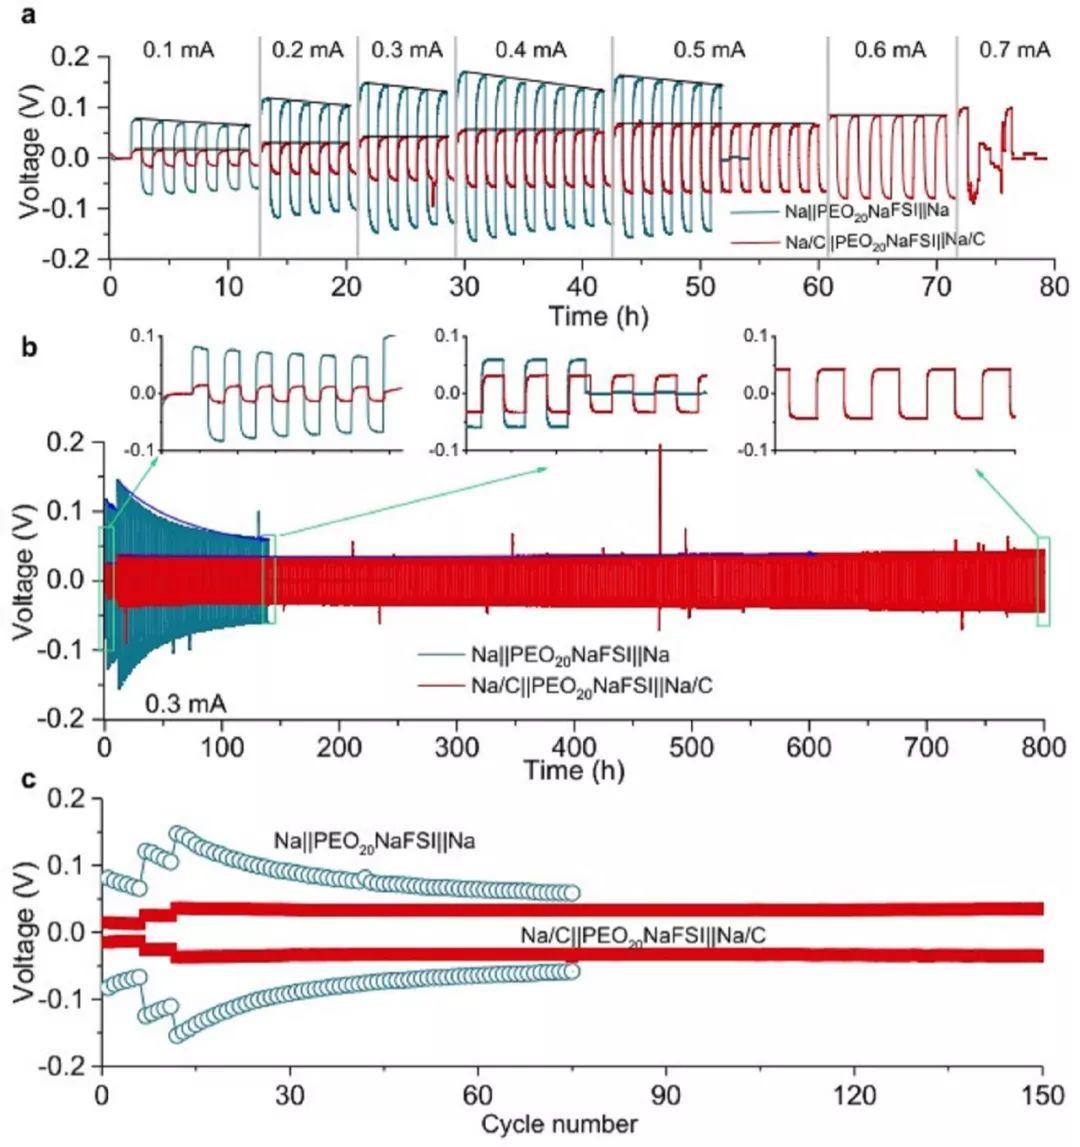 Angew:聚合物全固态钠电池的负极-电解质界面调控